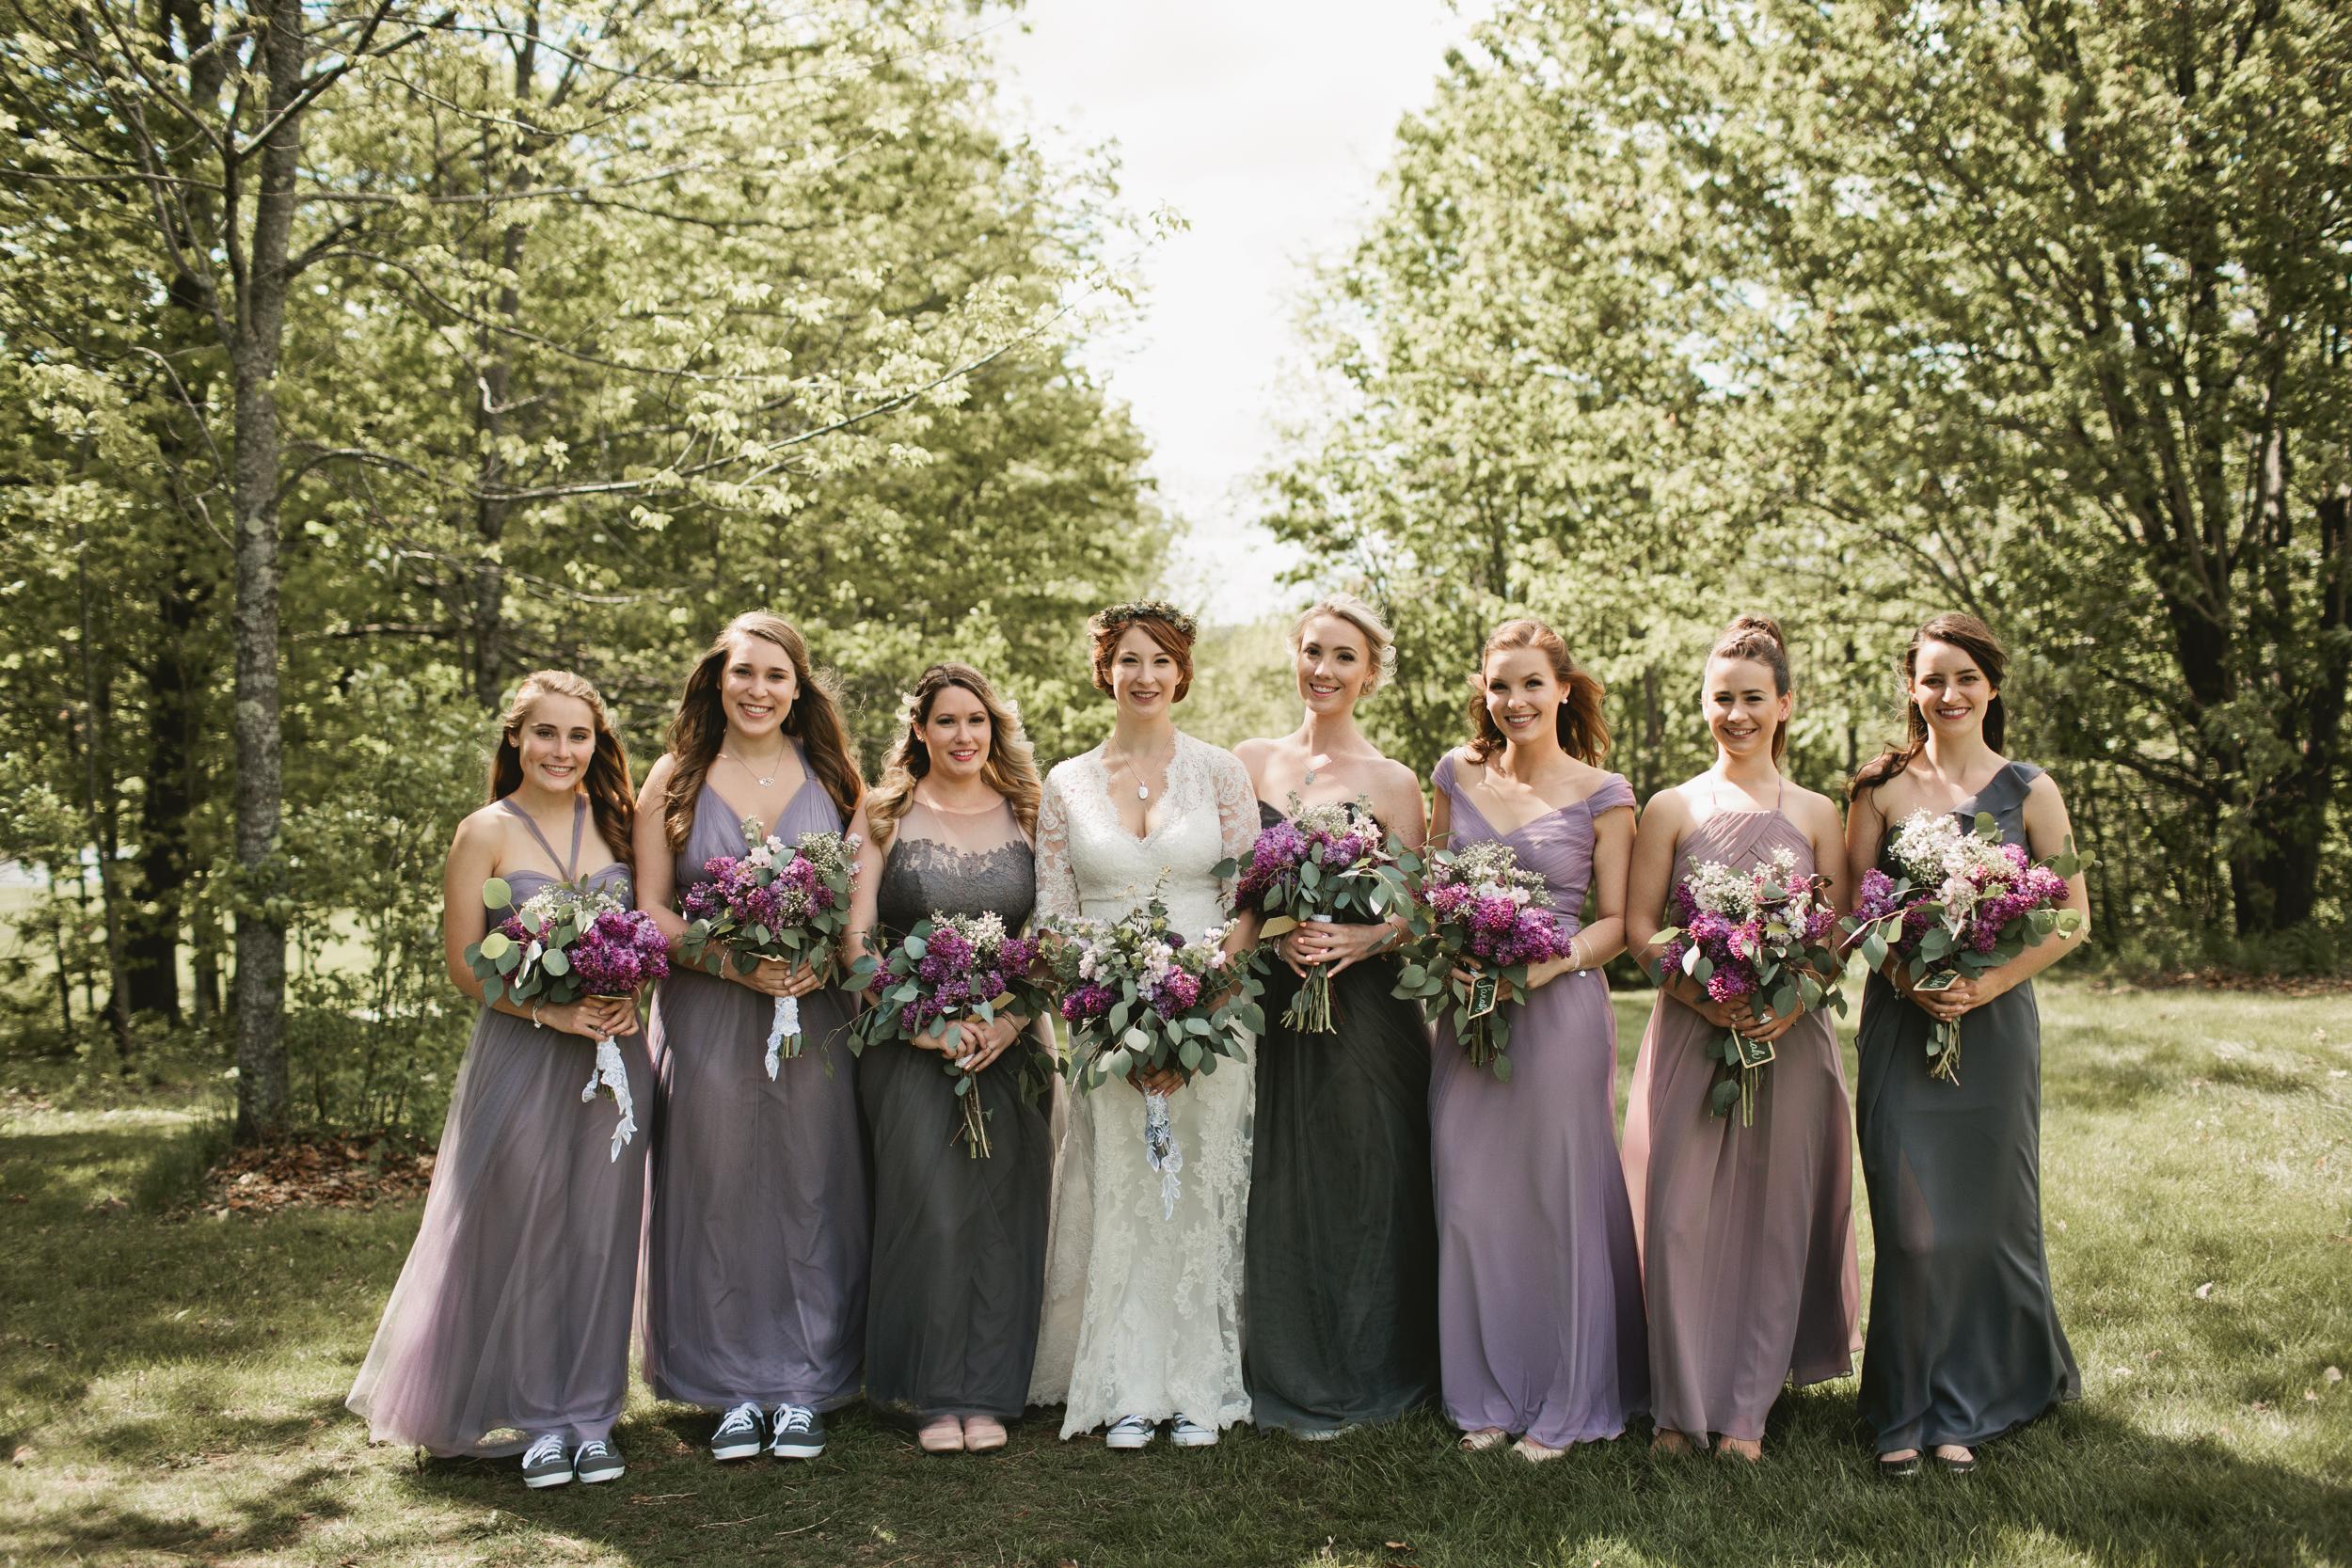 Spring-Meadows-Maine-Wedding-124.jpg